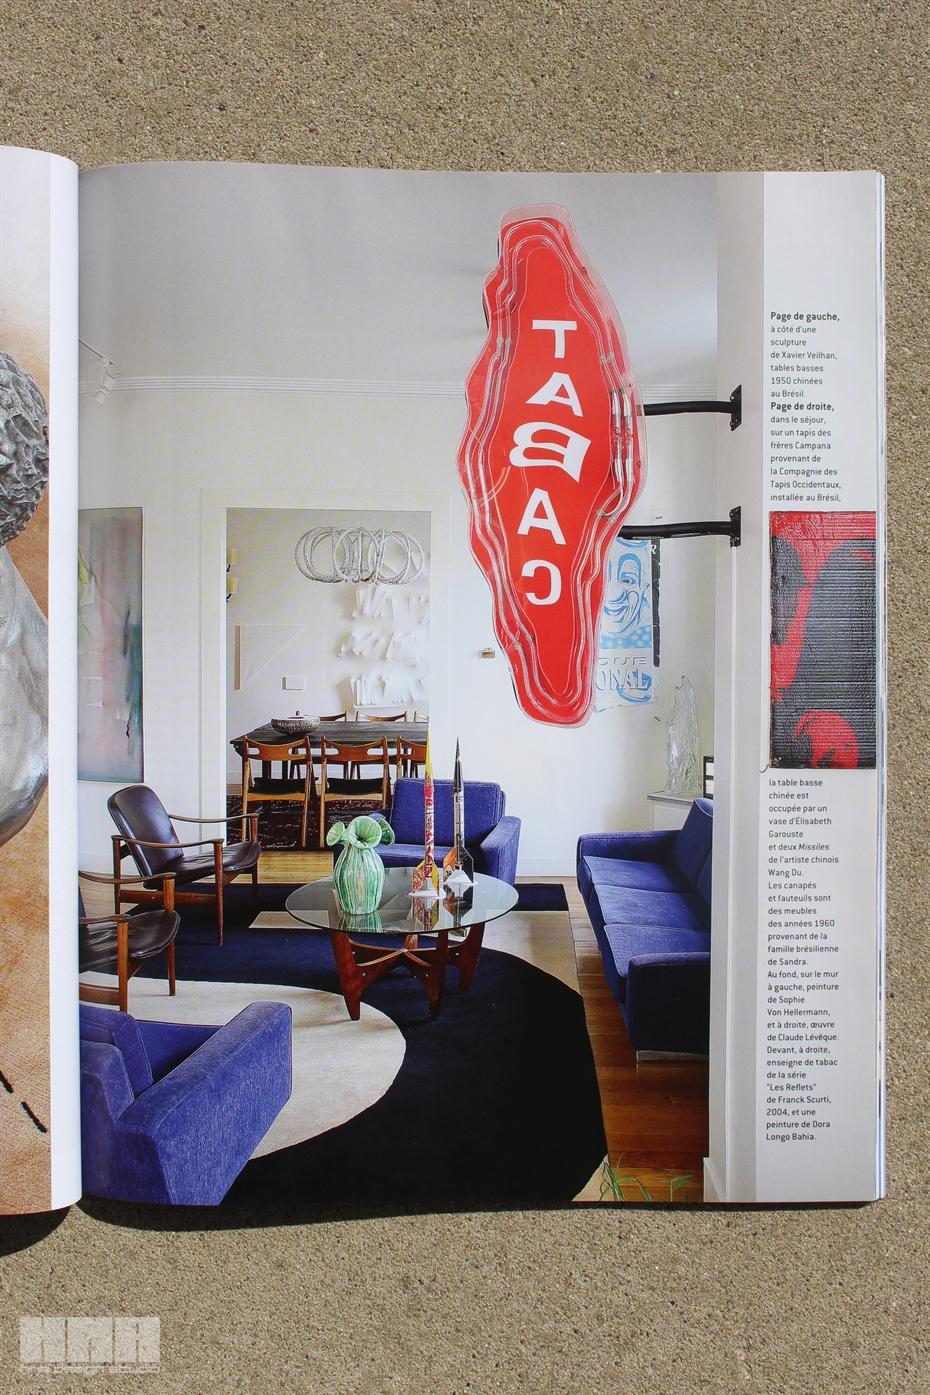 hna design inspiralo magazinok paris 16